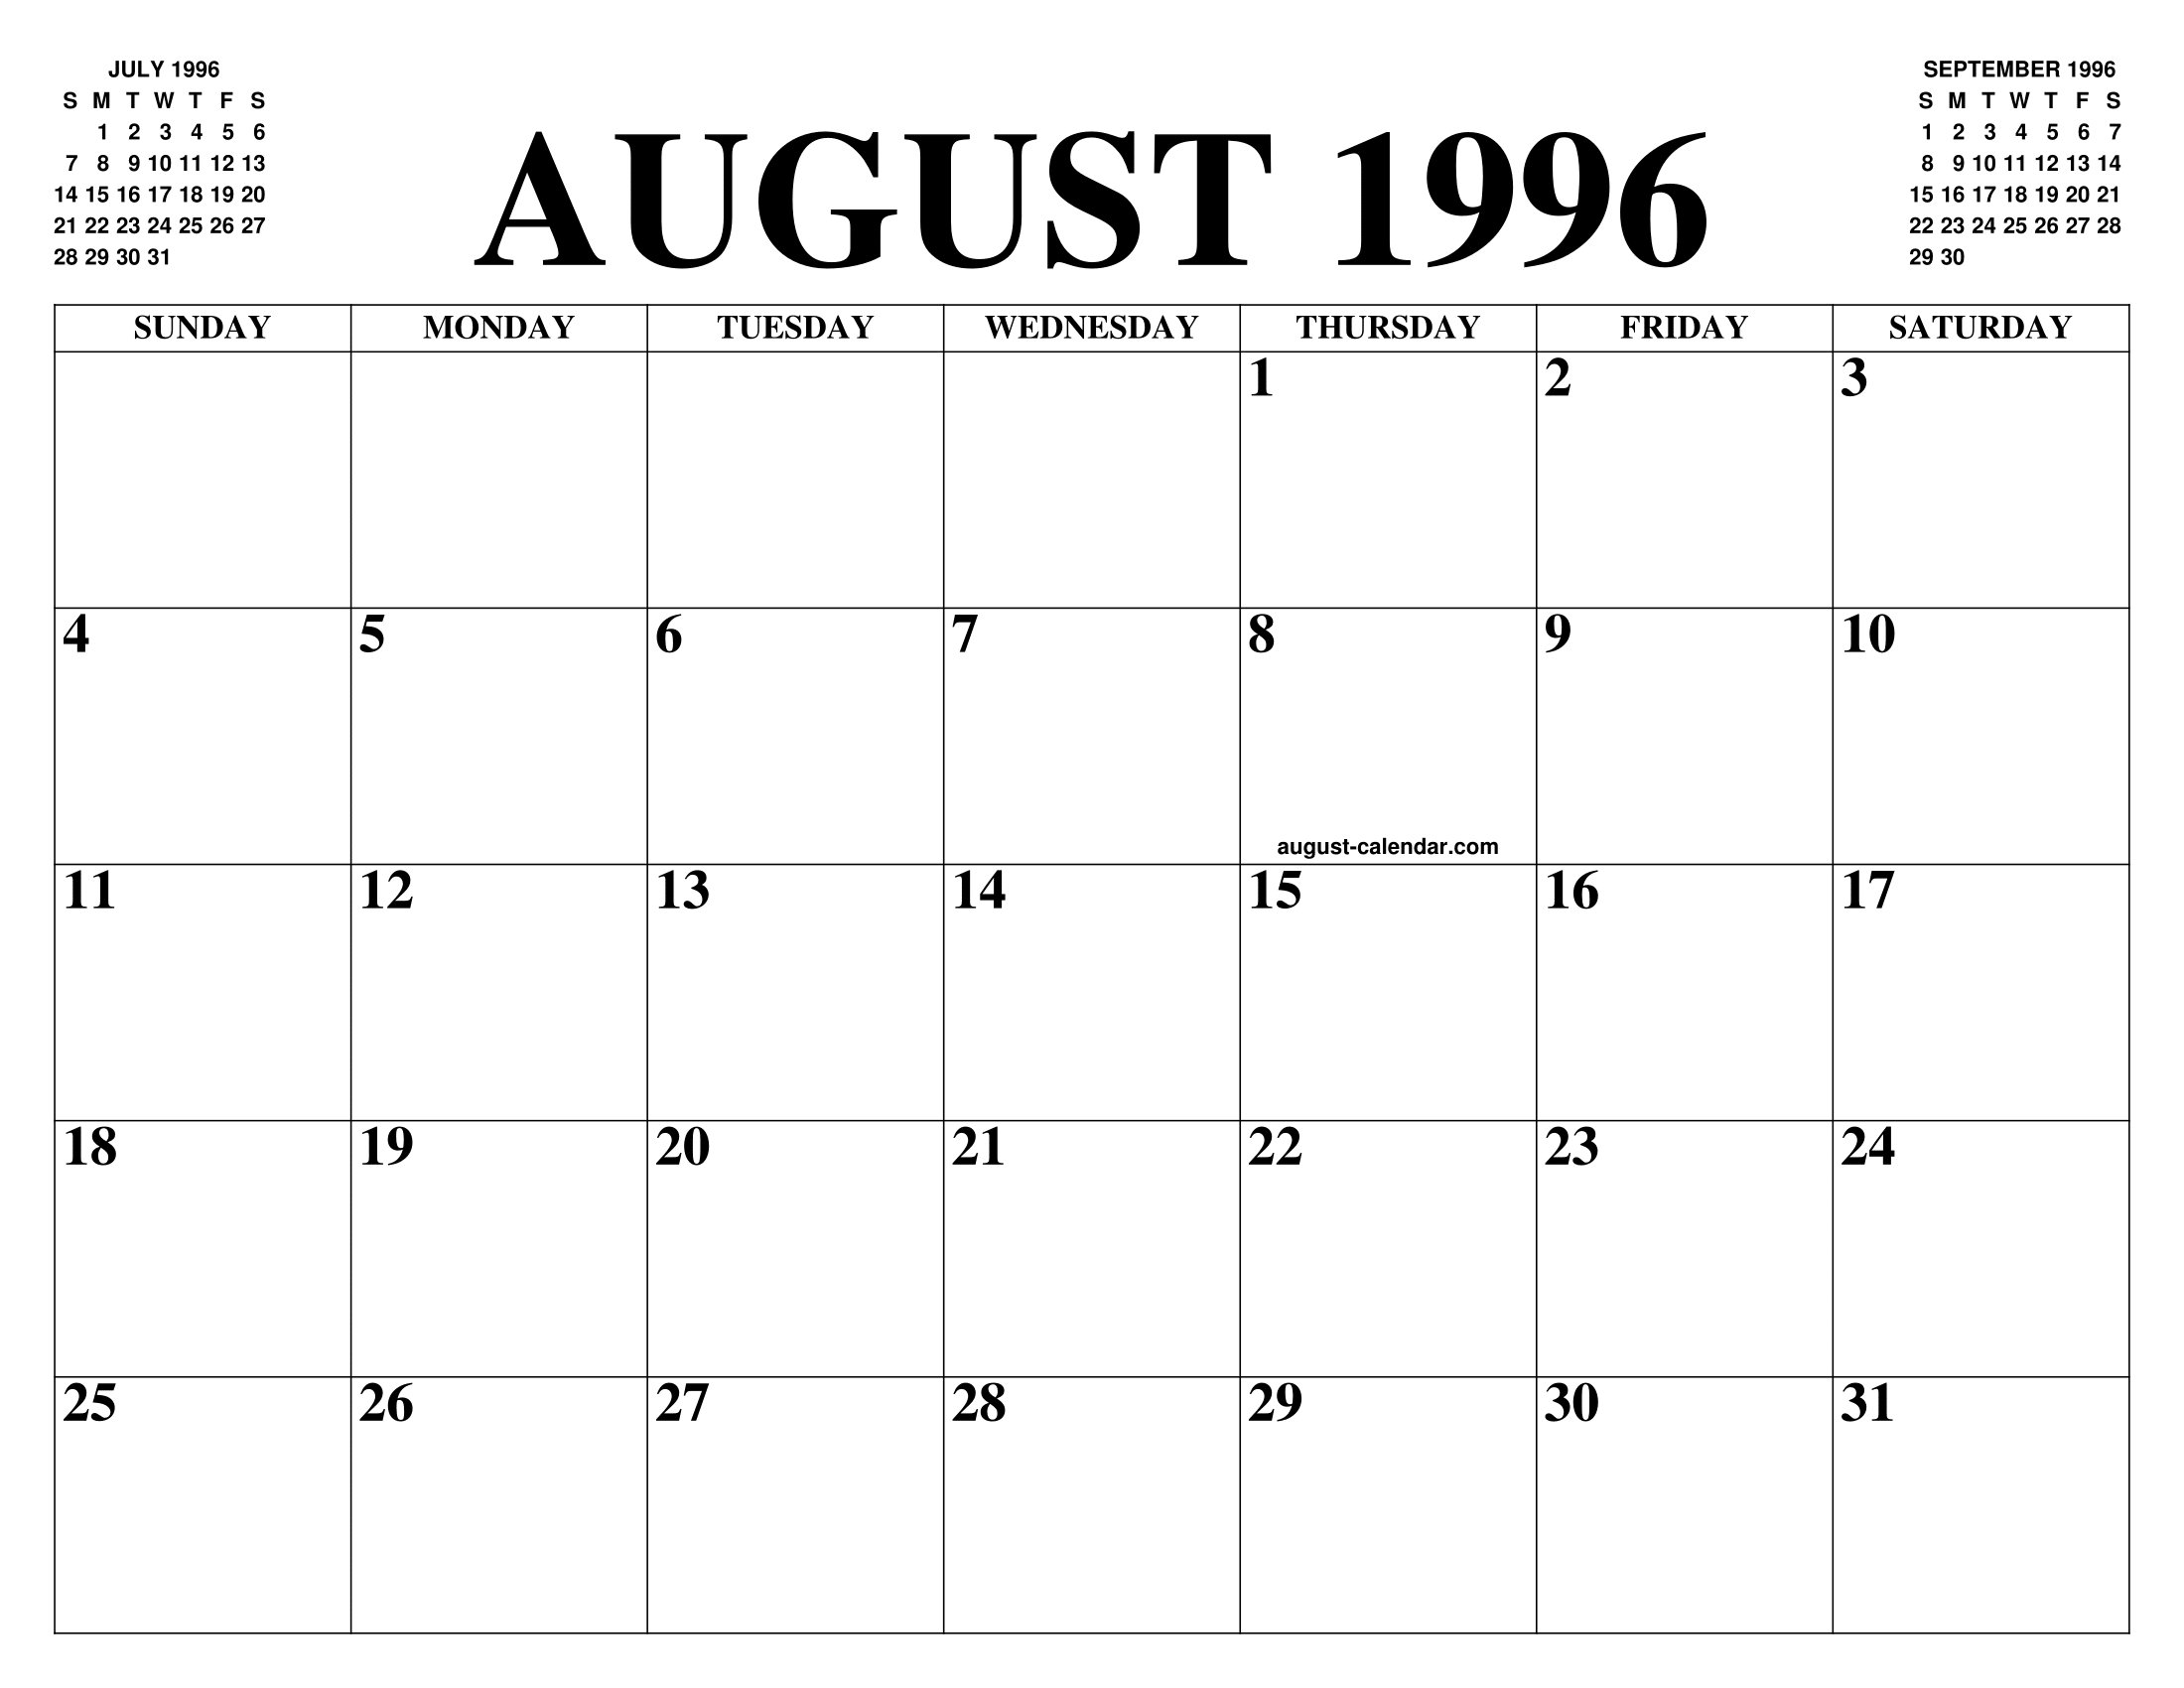 Calendario 1996.August 1996 Calendar Of The Month Free Printable August